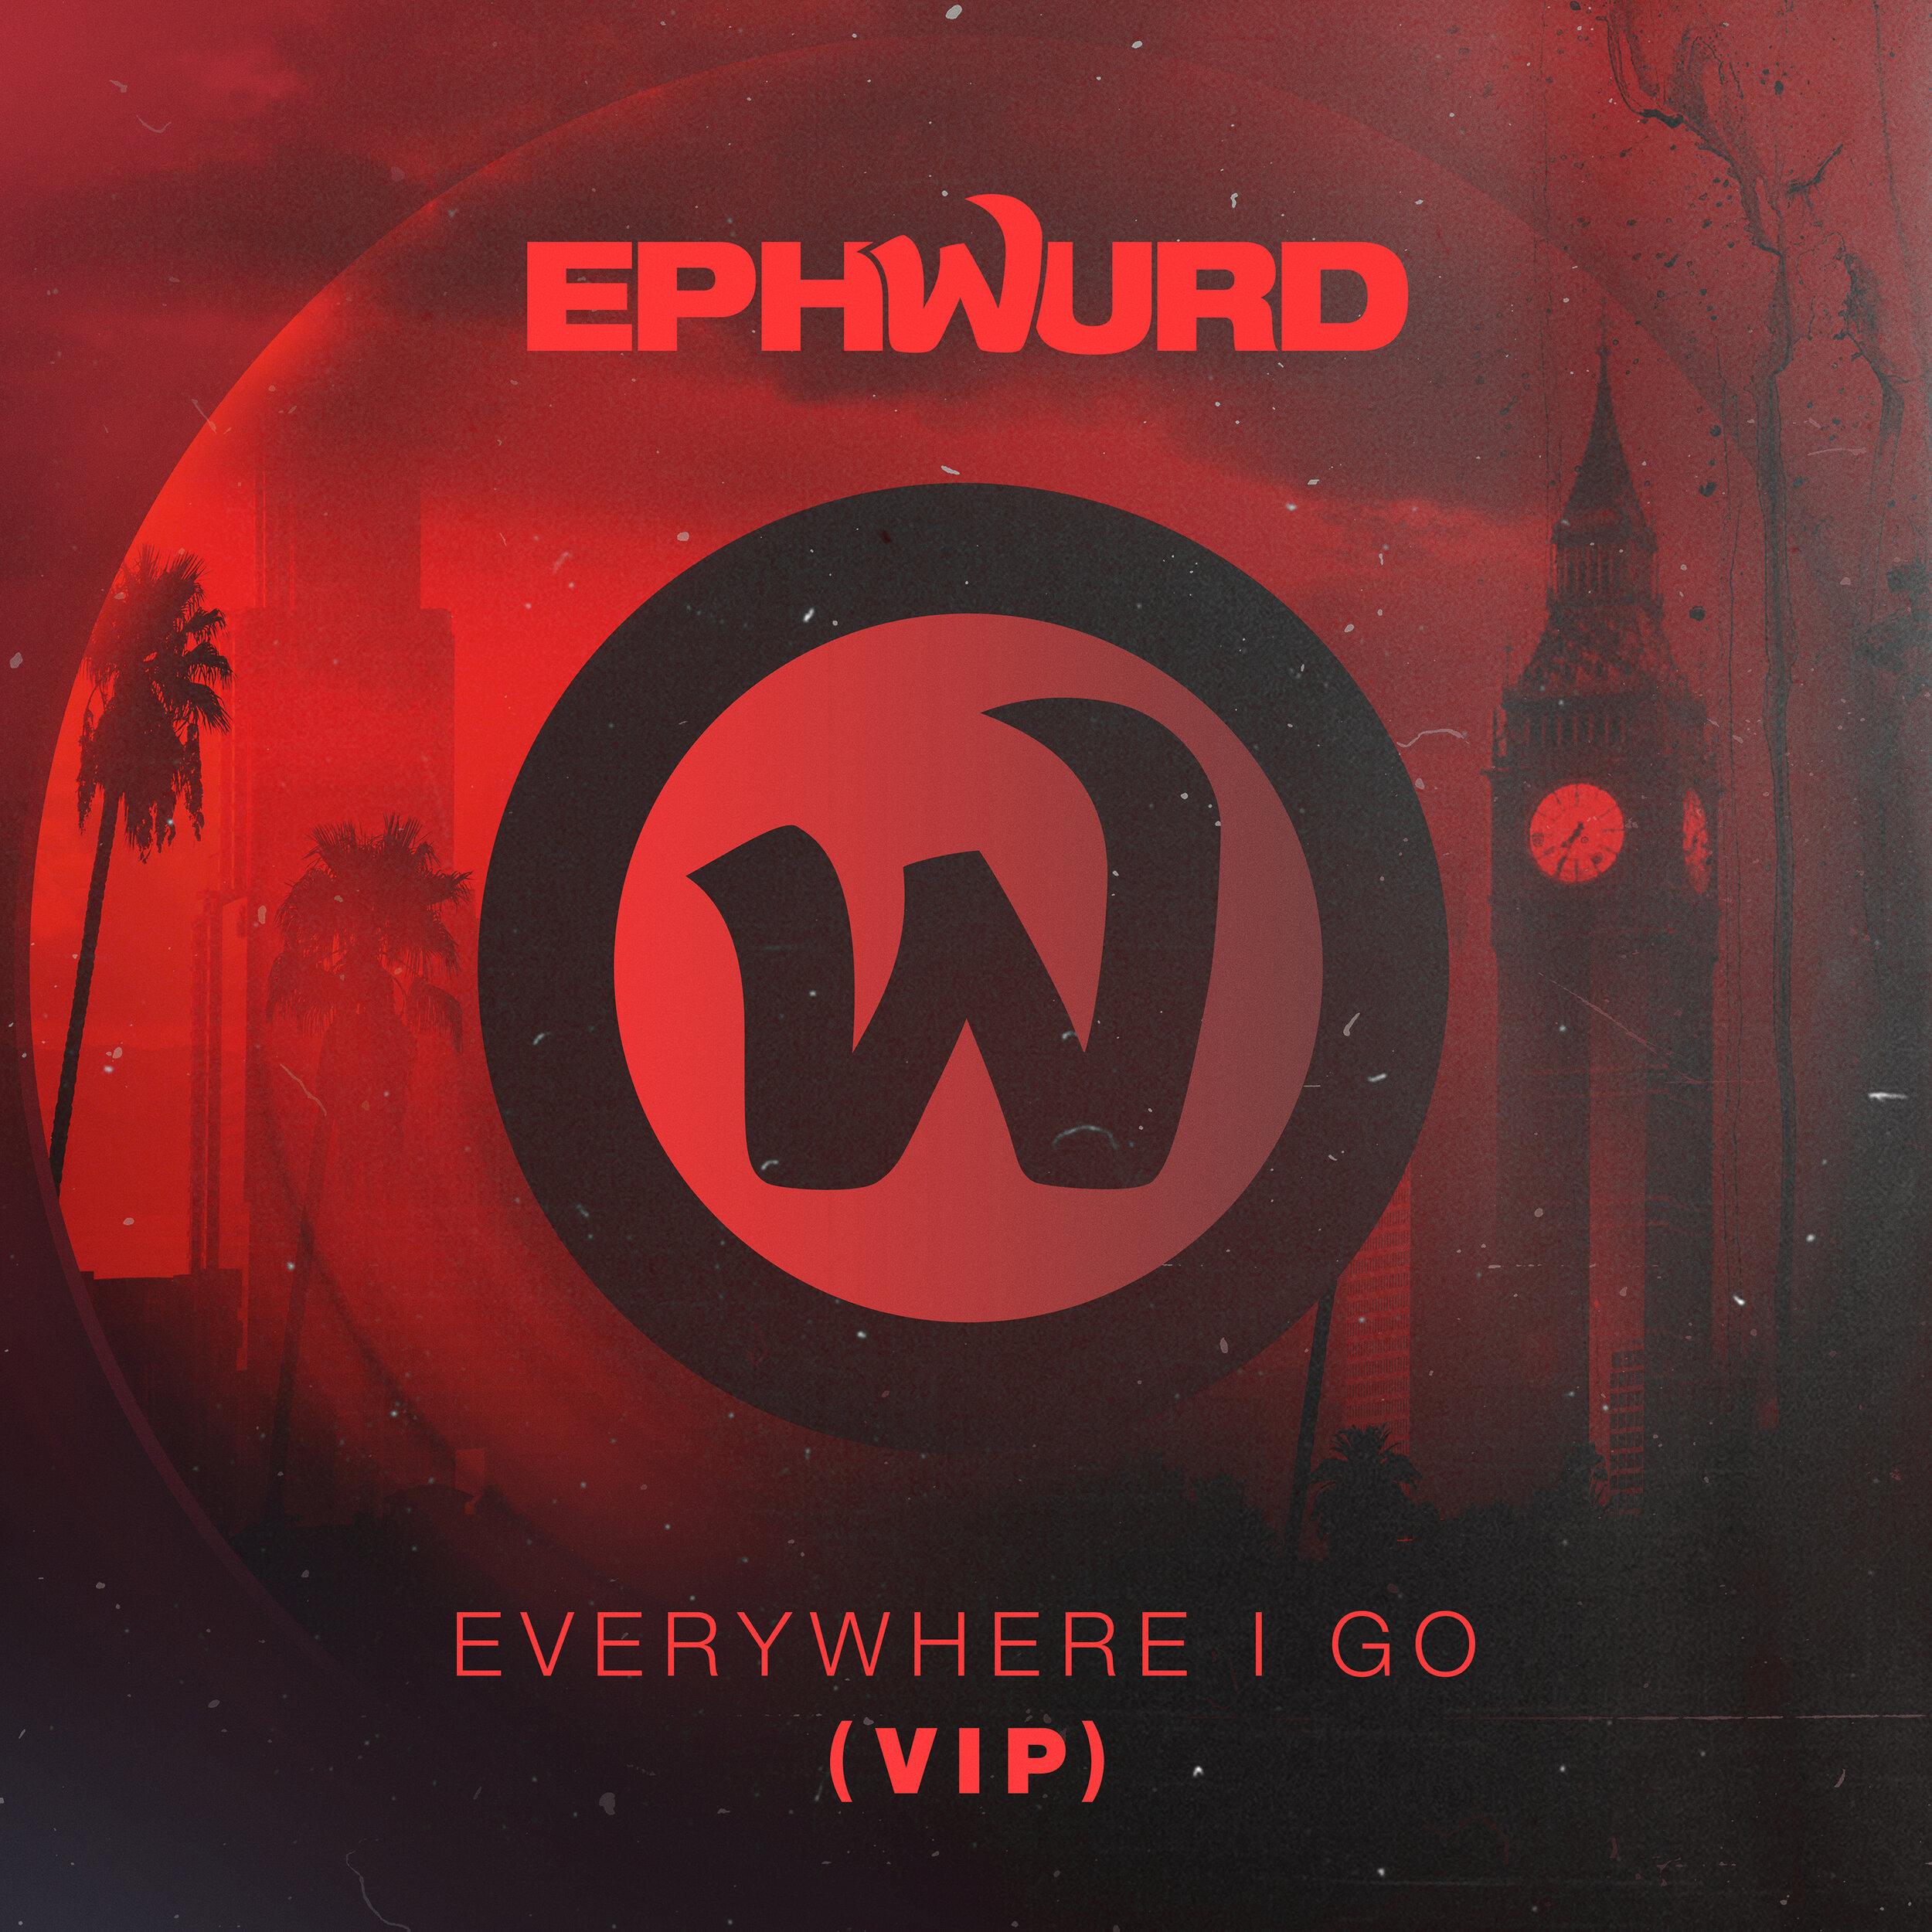 ephwurd_art_vip_3000px.jpg